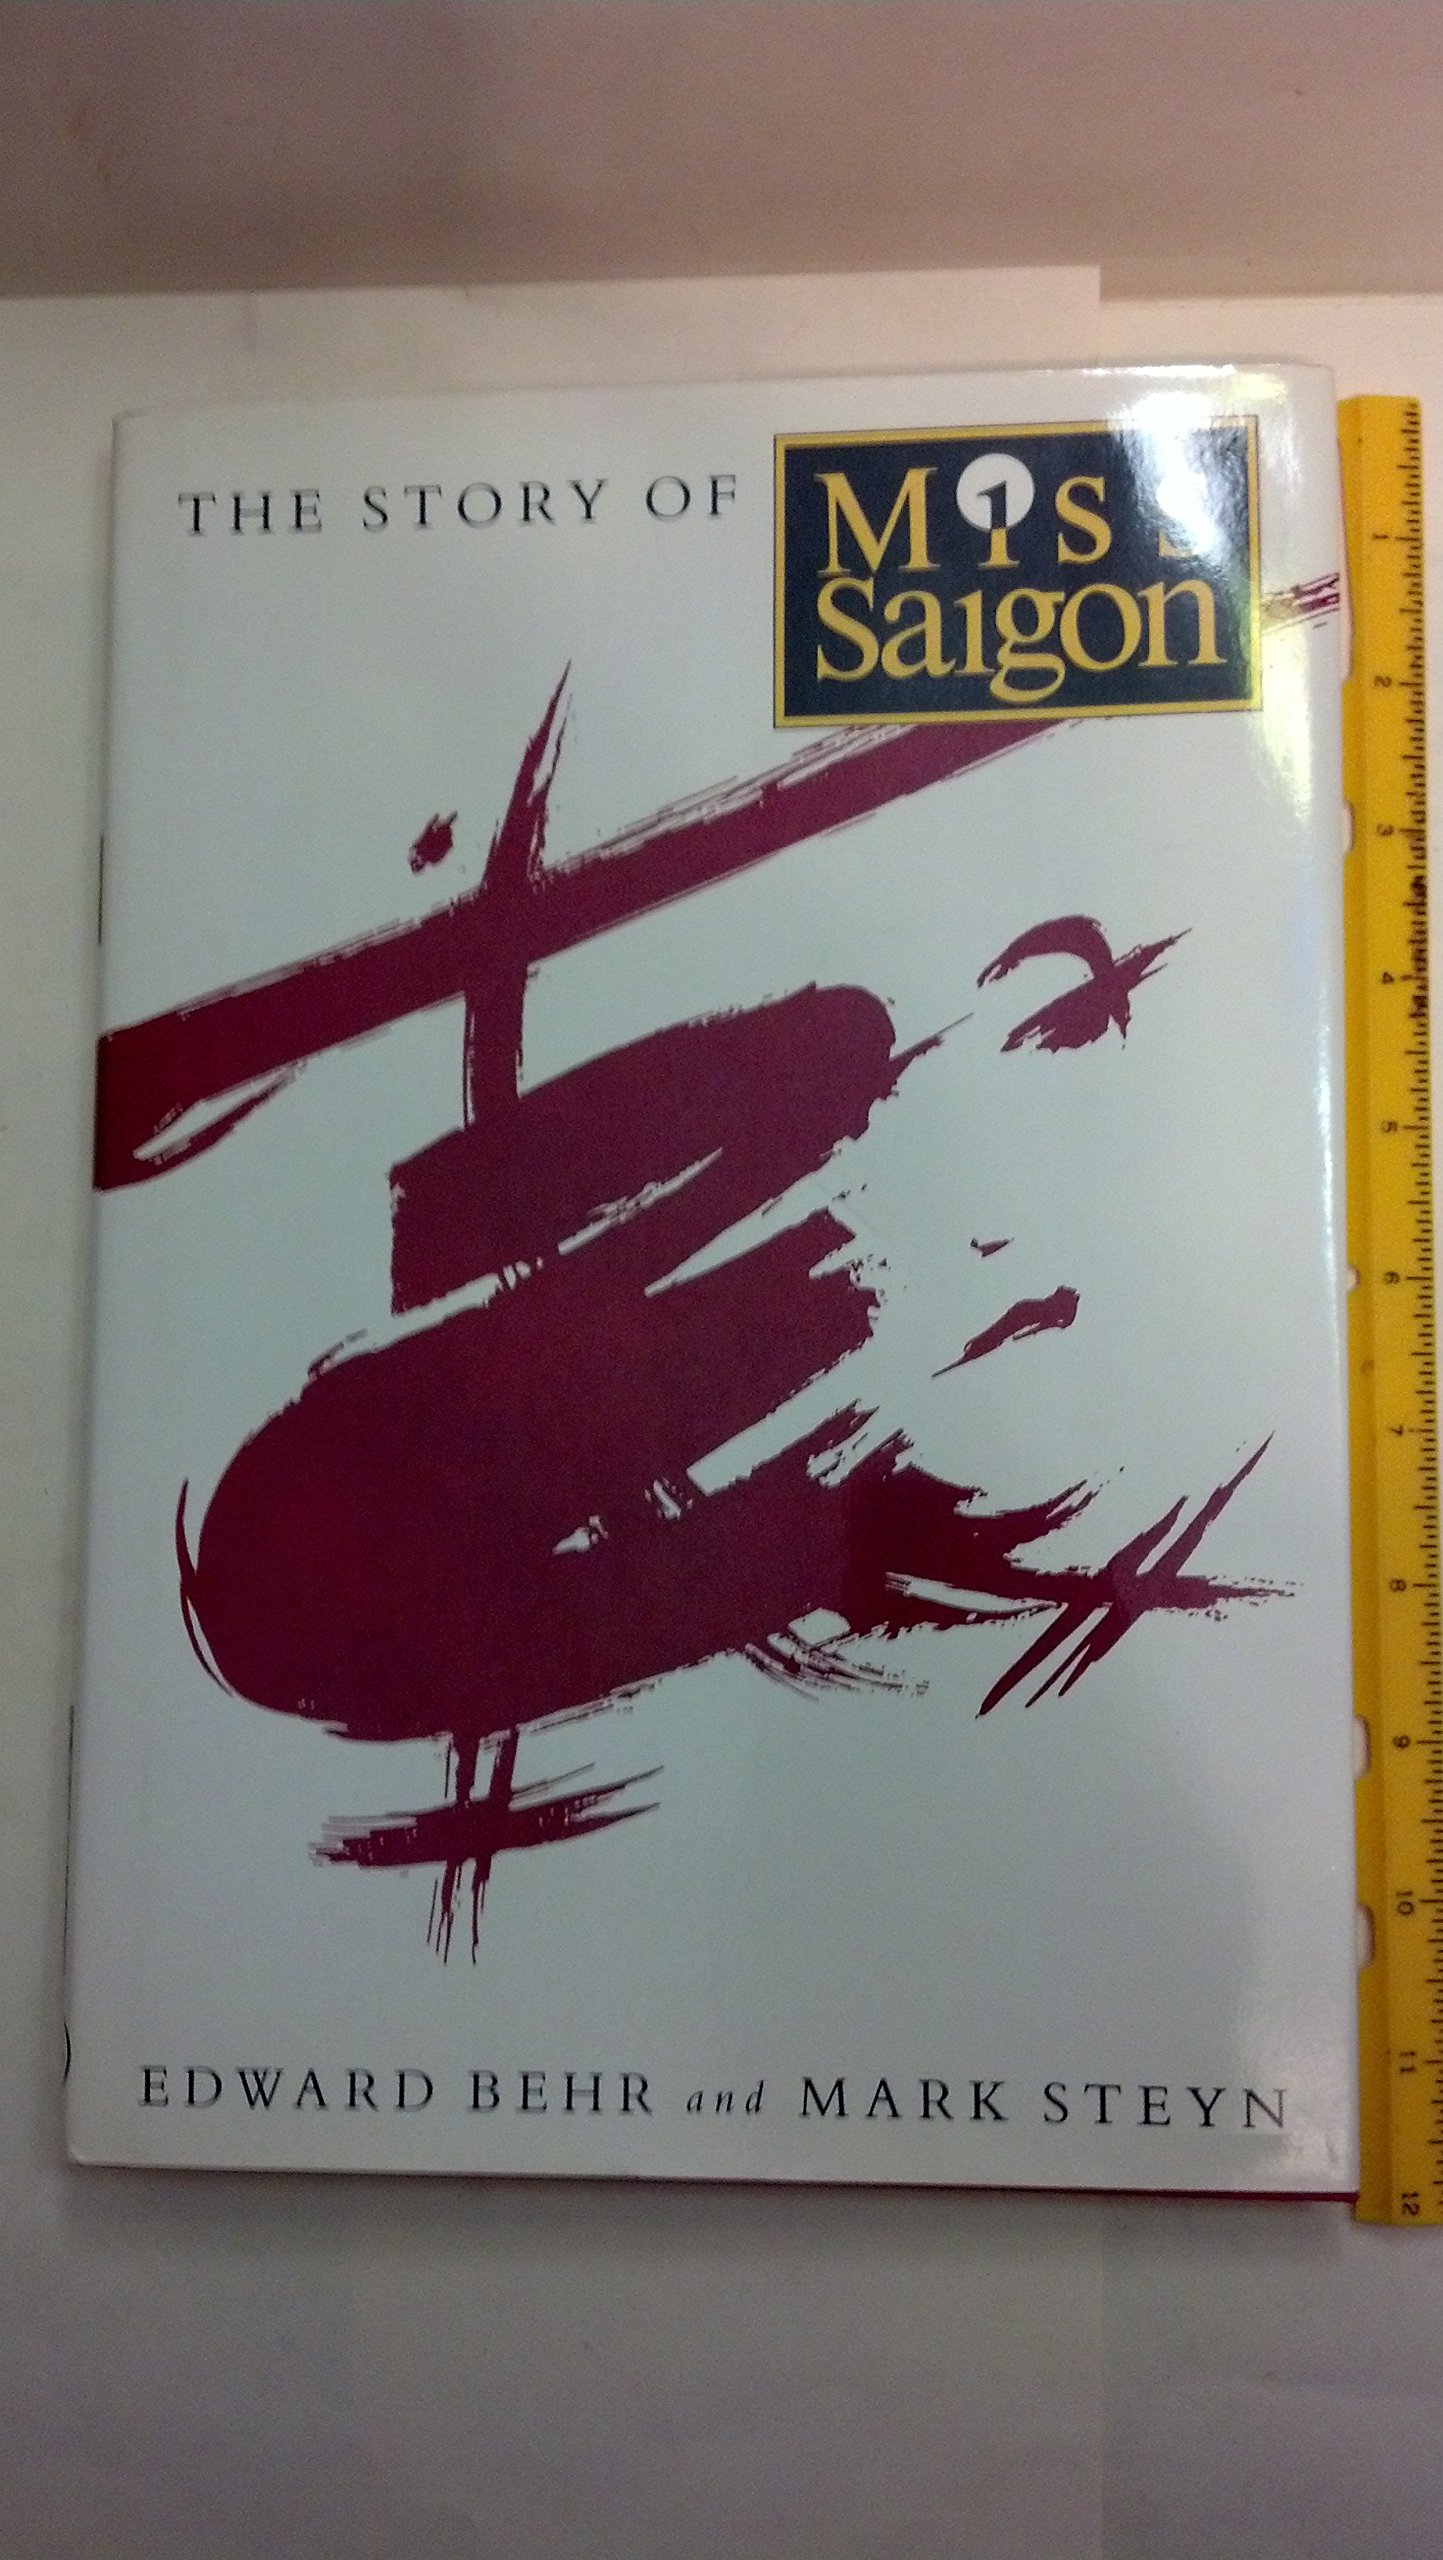 The Story Of Miss Saigon